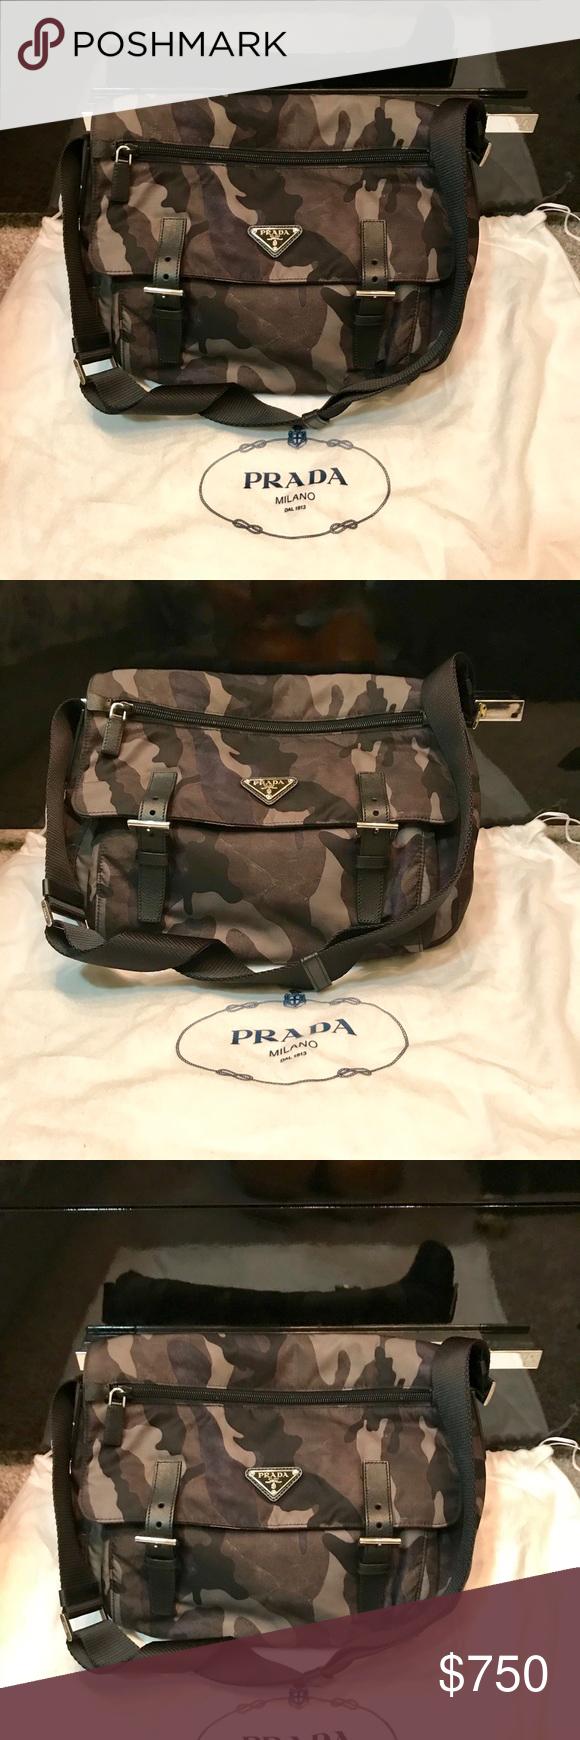 102052ccf9 PRADA Camouflage messenger bag Prada Tessuto Camouflage Messenger ...